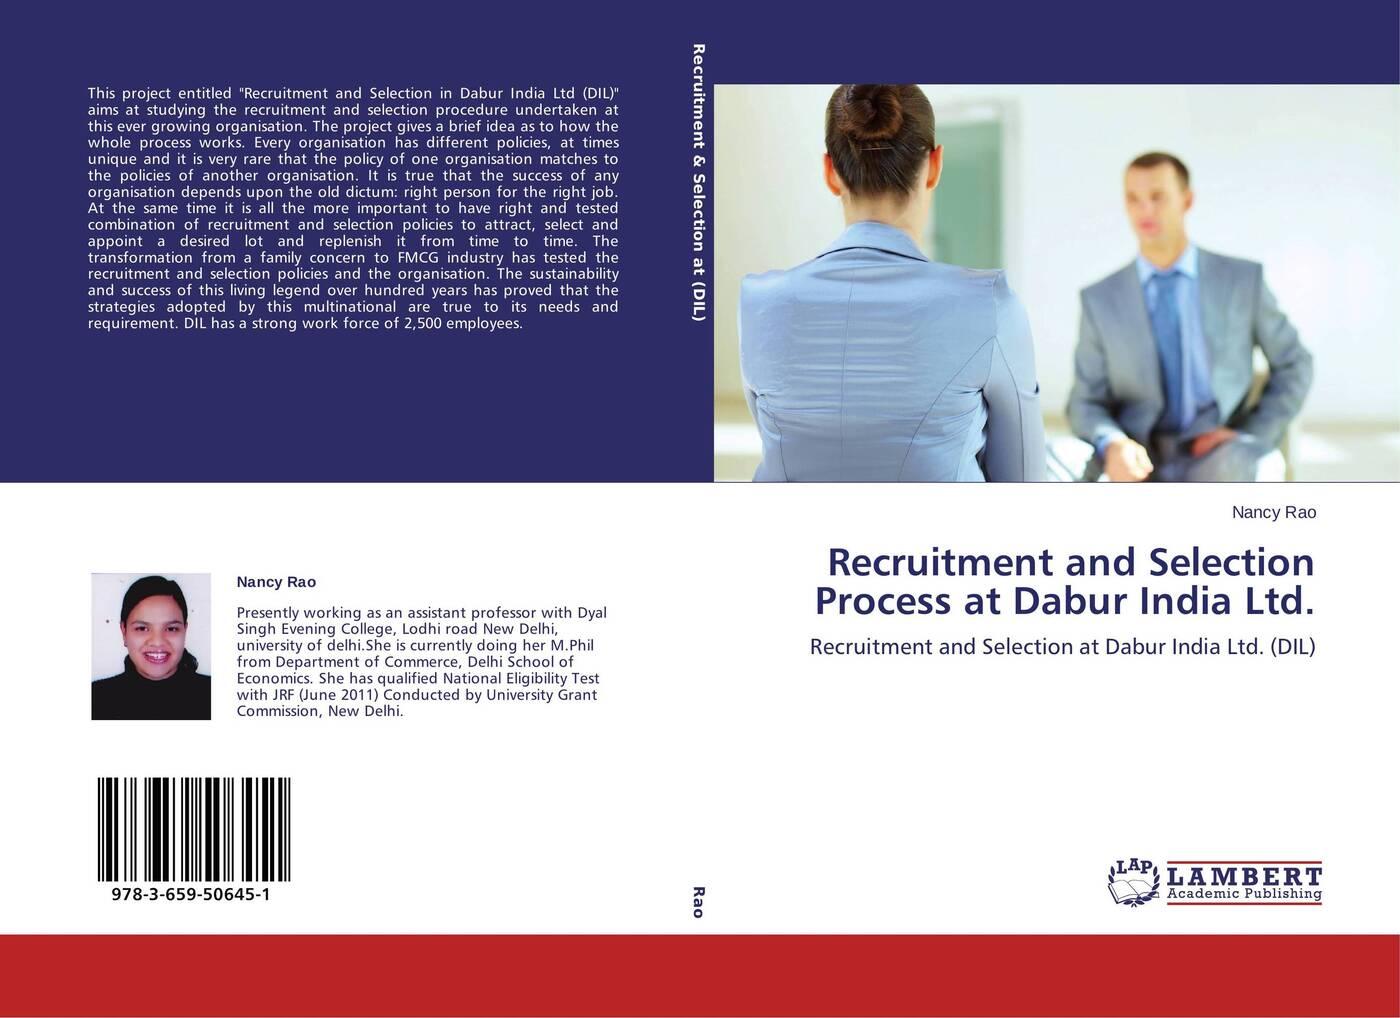 купить Nancy Rao Recruitment and Selection Process at Dabur India Ltd. по цене 4358 рублей